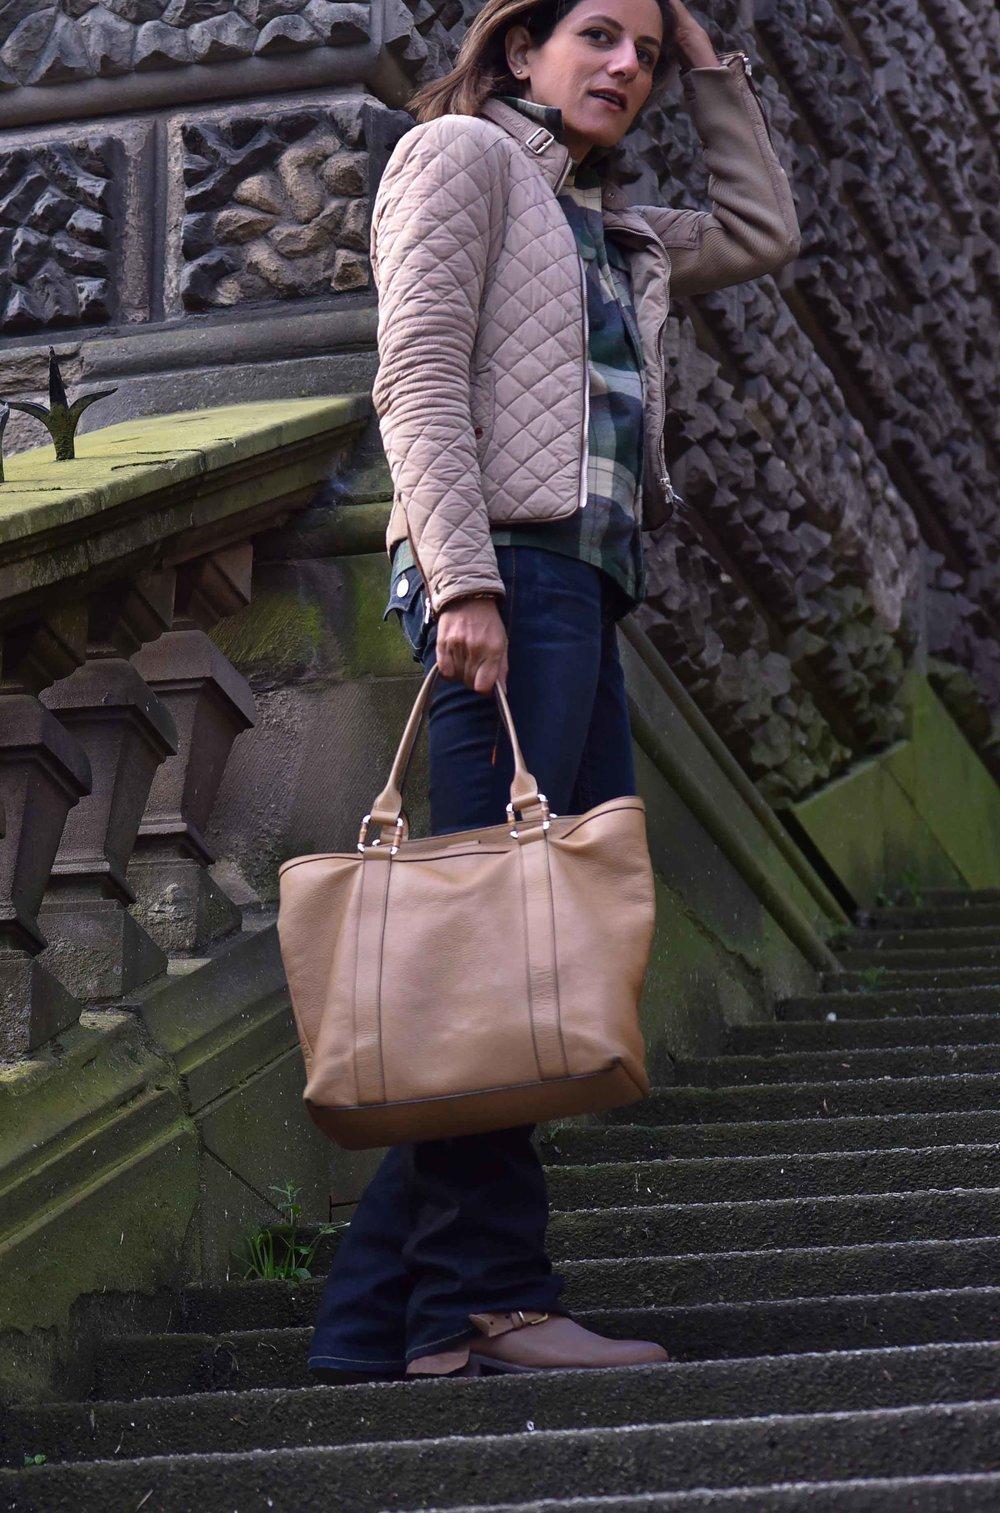 Ralph Lauren check shirt, Zara quilted jacket, True Religion jeans, Gucci bag, Edinburgh, Scotland. Image©sourcingstyle.com